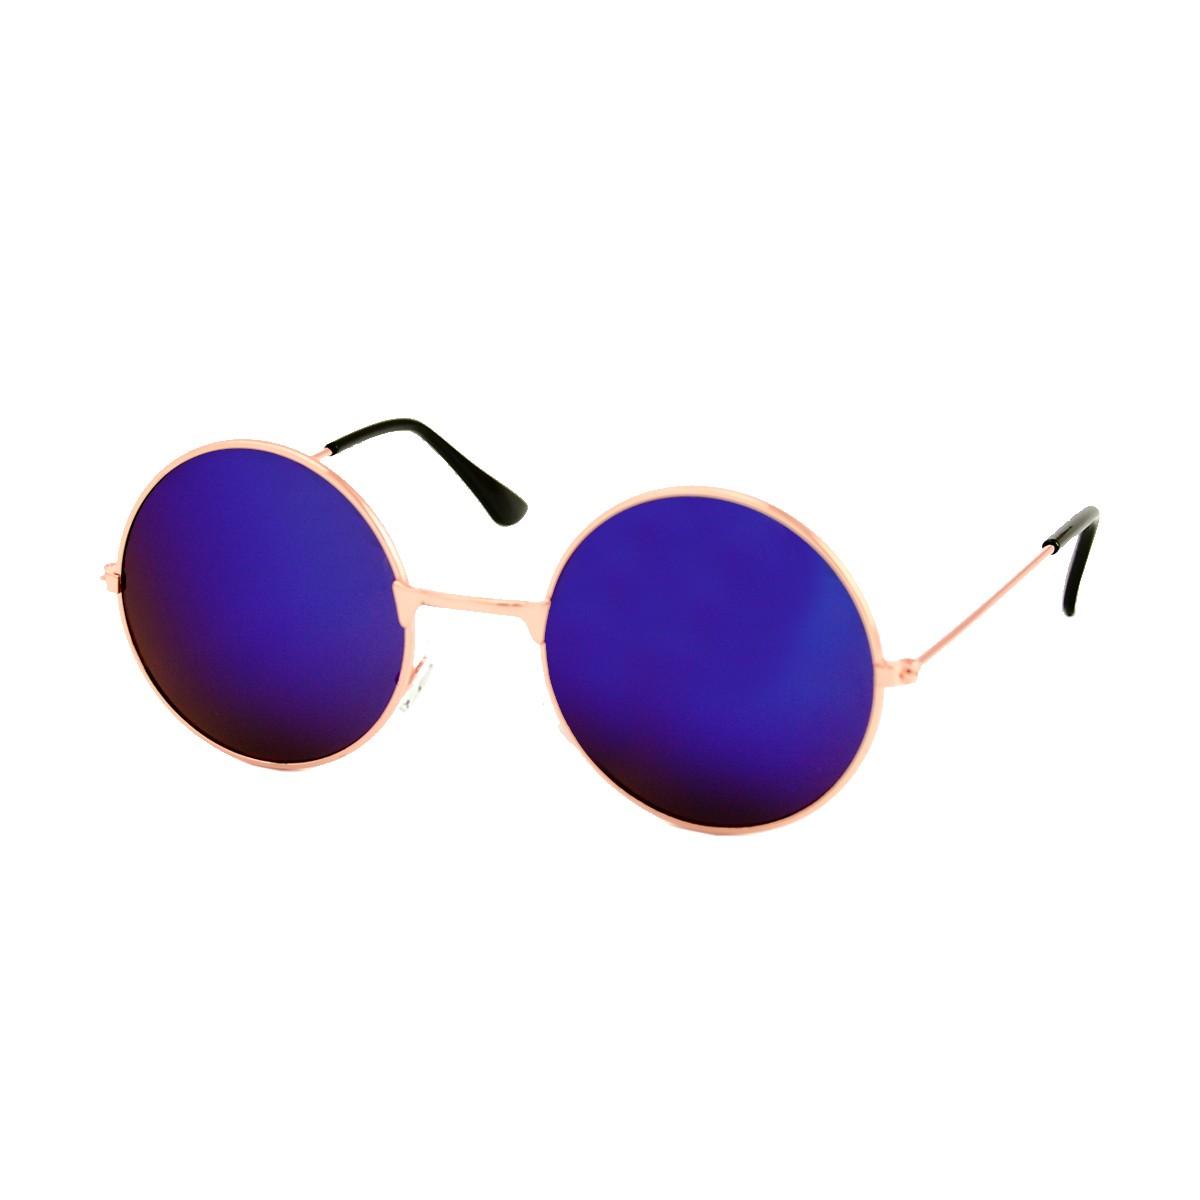 Round golden sunglasses - blue purple mirrored glass